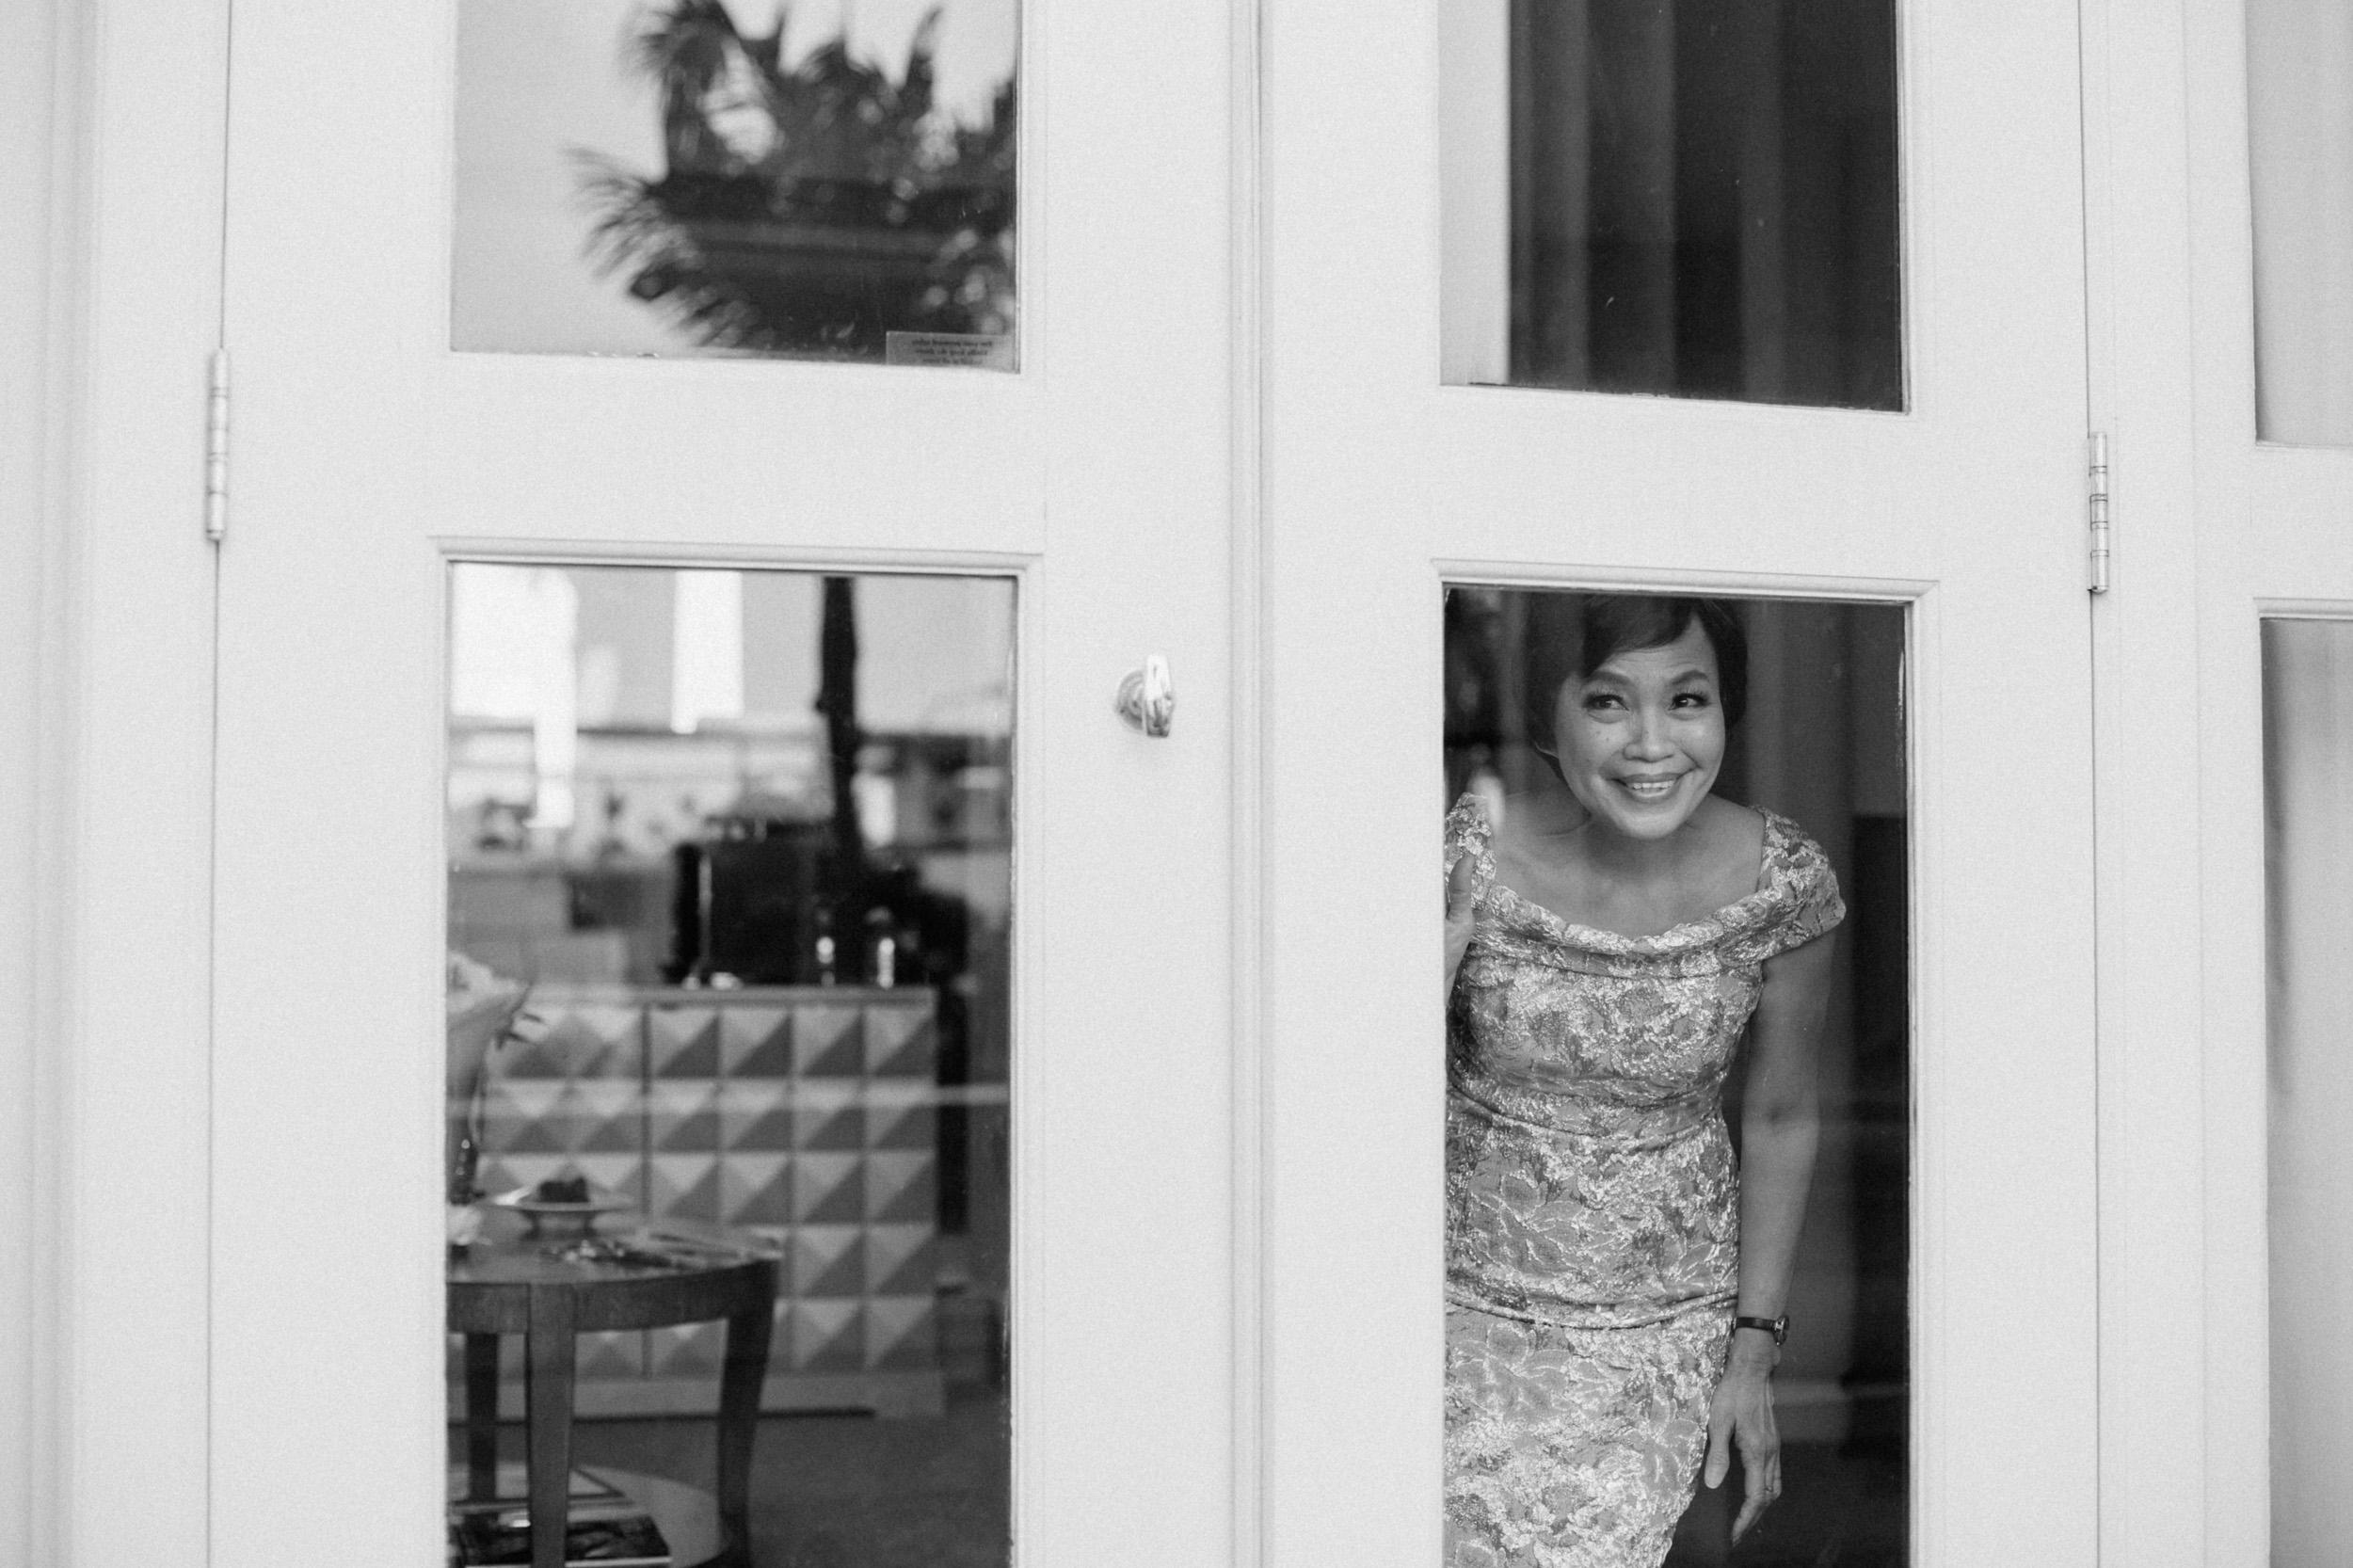 singapore-wedding-photographer-photography-wmt2017-099.jpg